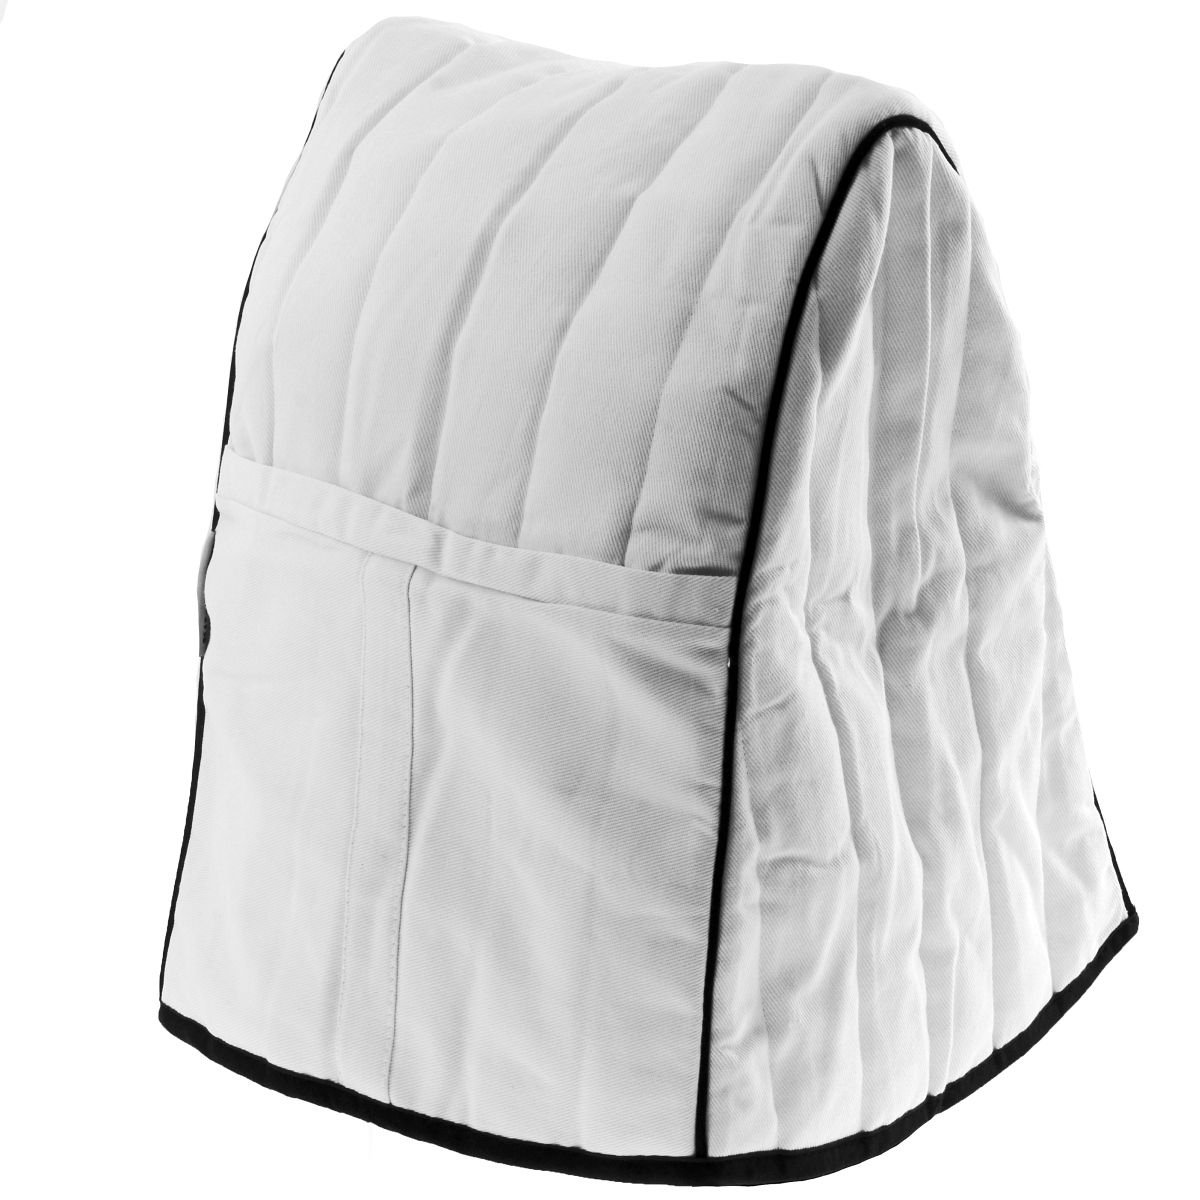 Kitchenaid KMCC1 - Accesorio funda protectora de algodón para 5ks (h.nr.:) KMCC1WH